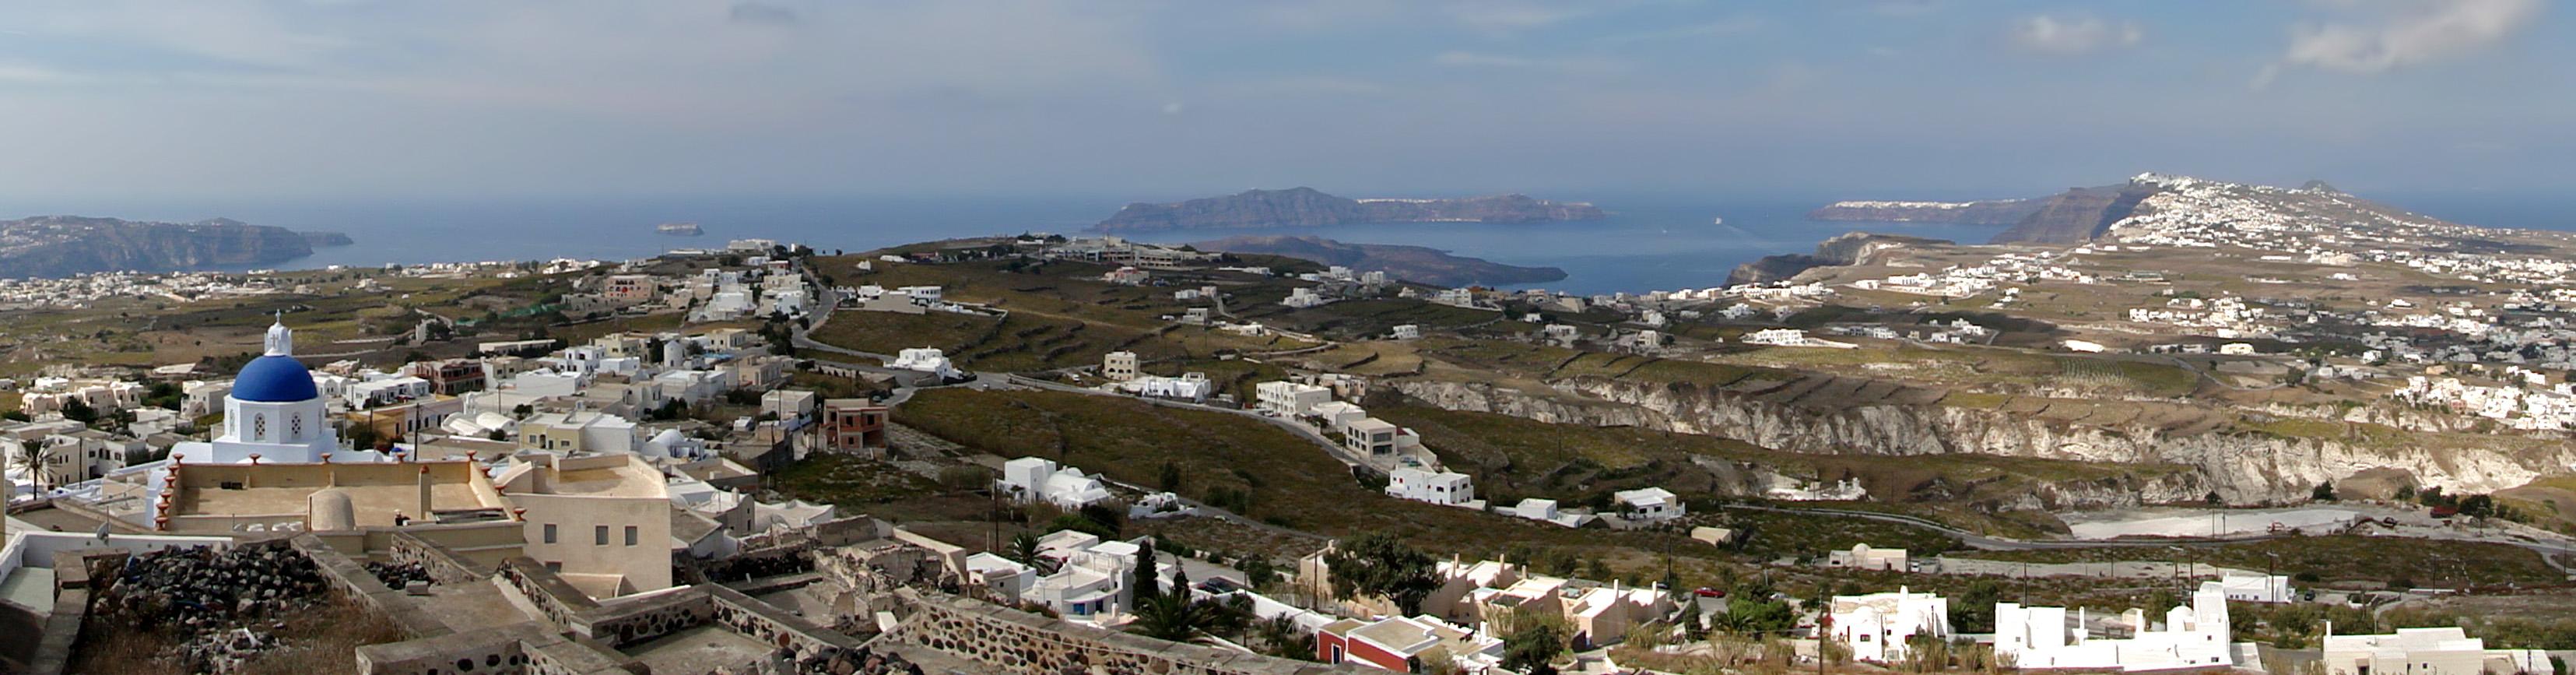 File:View of Santorini from Pyrgos.jpg - Wikimedia Commons